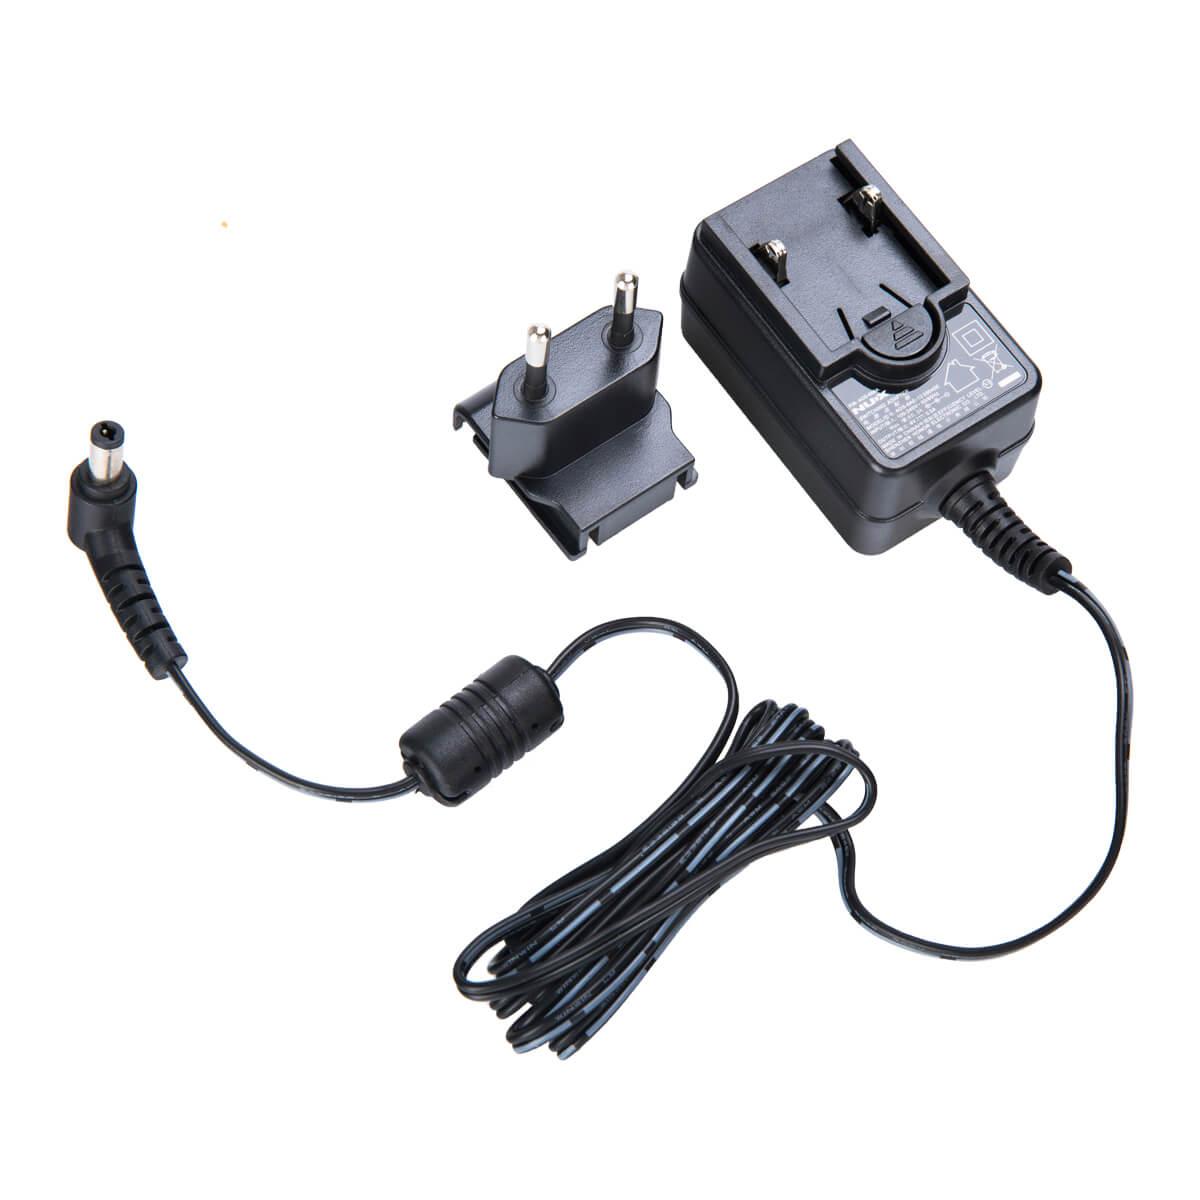 Nux ACD-006A strømforsyning 9V